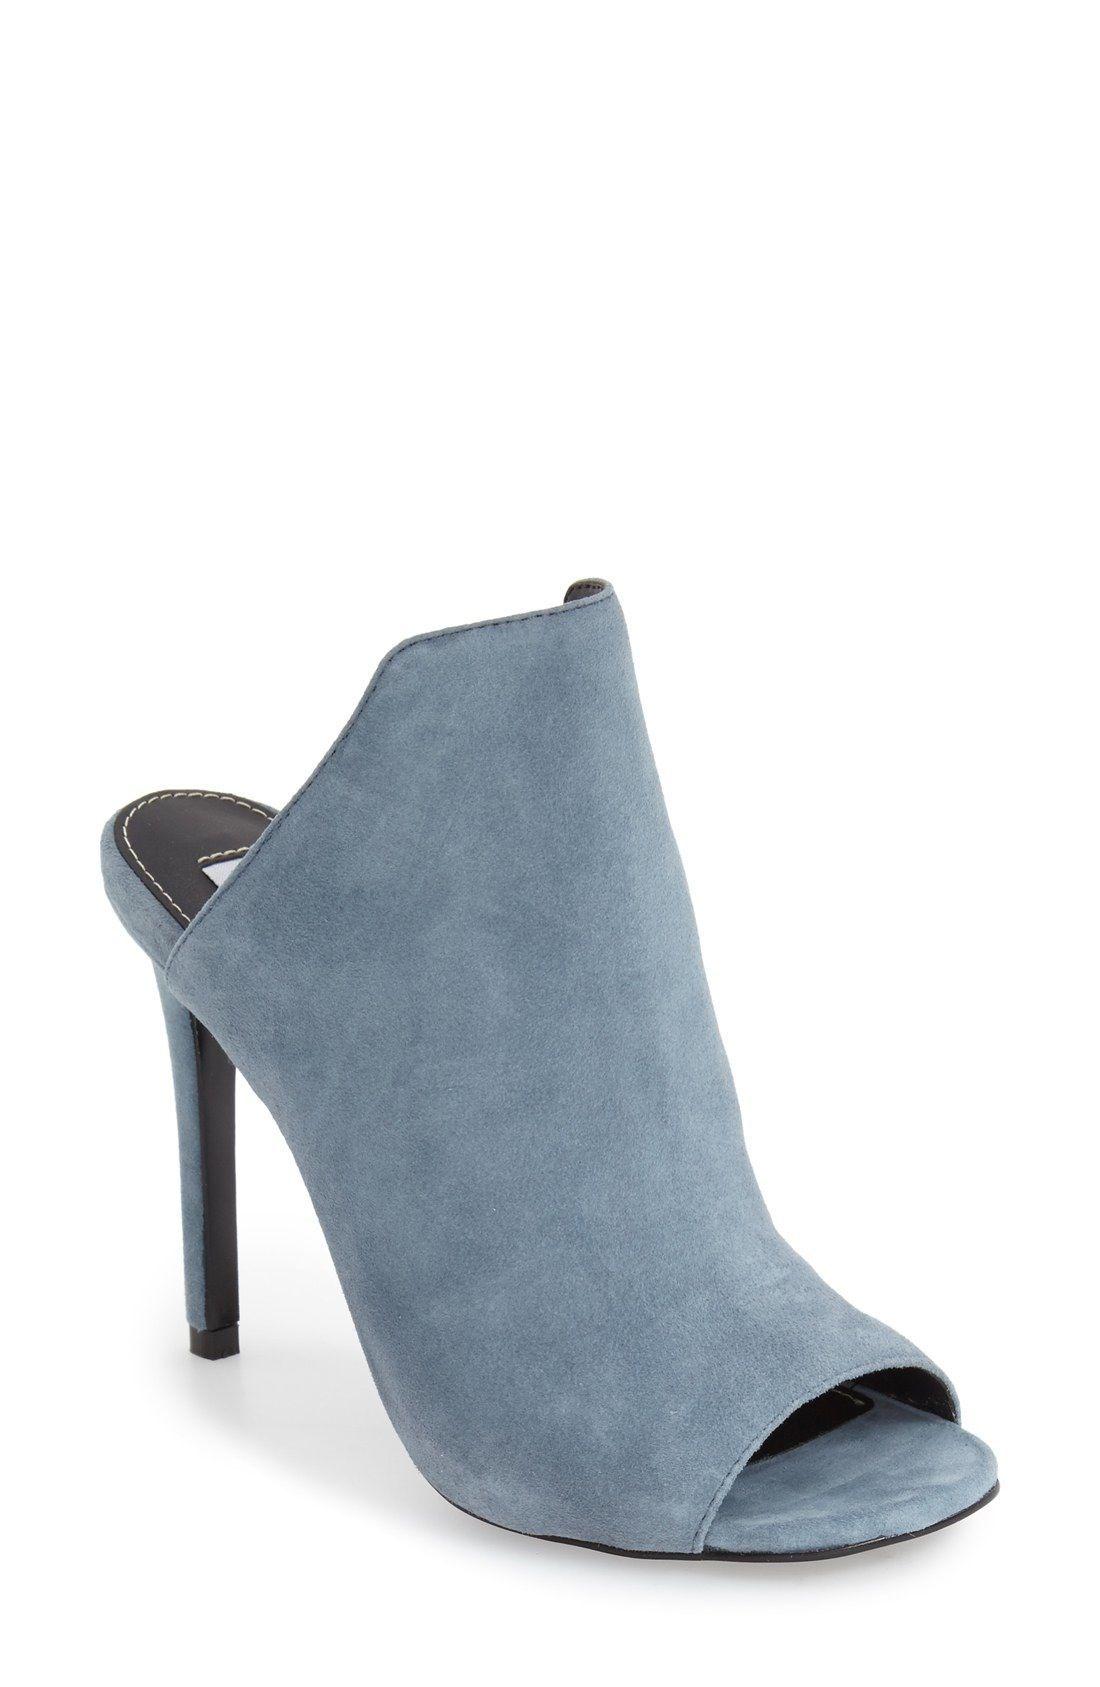 db28f83182f Steve Madden  Sooki  Open Toe Sandal (Women) available at  Nordstrom ...